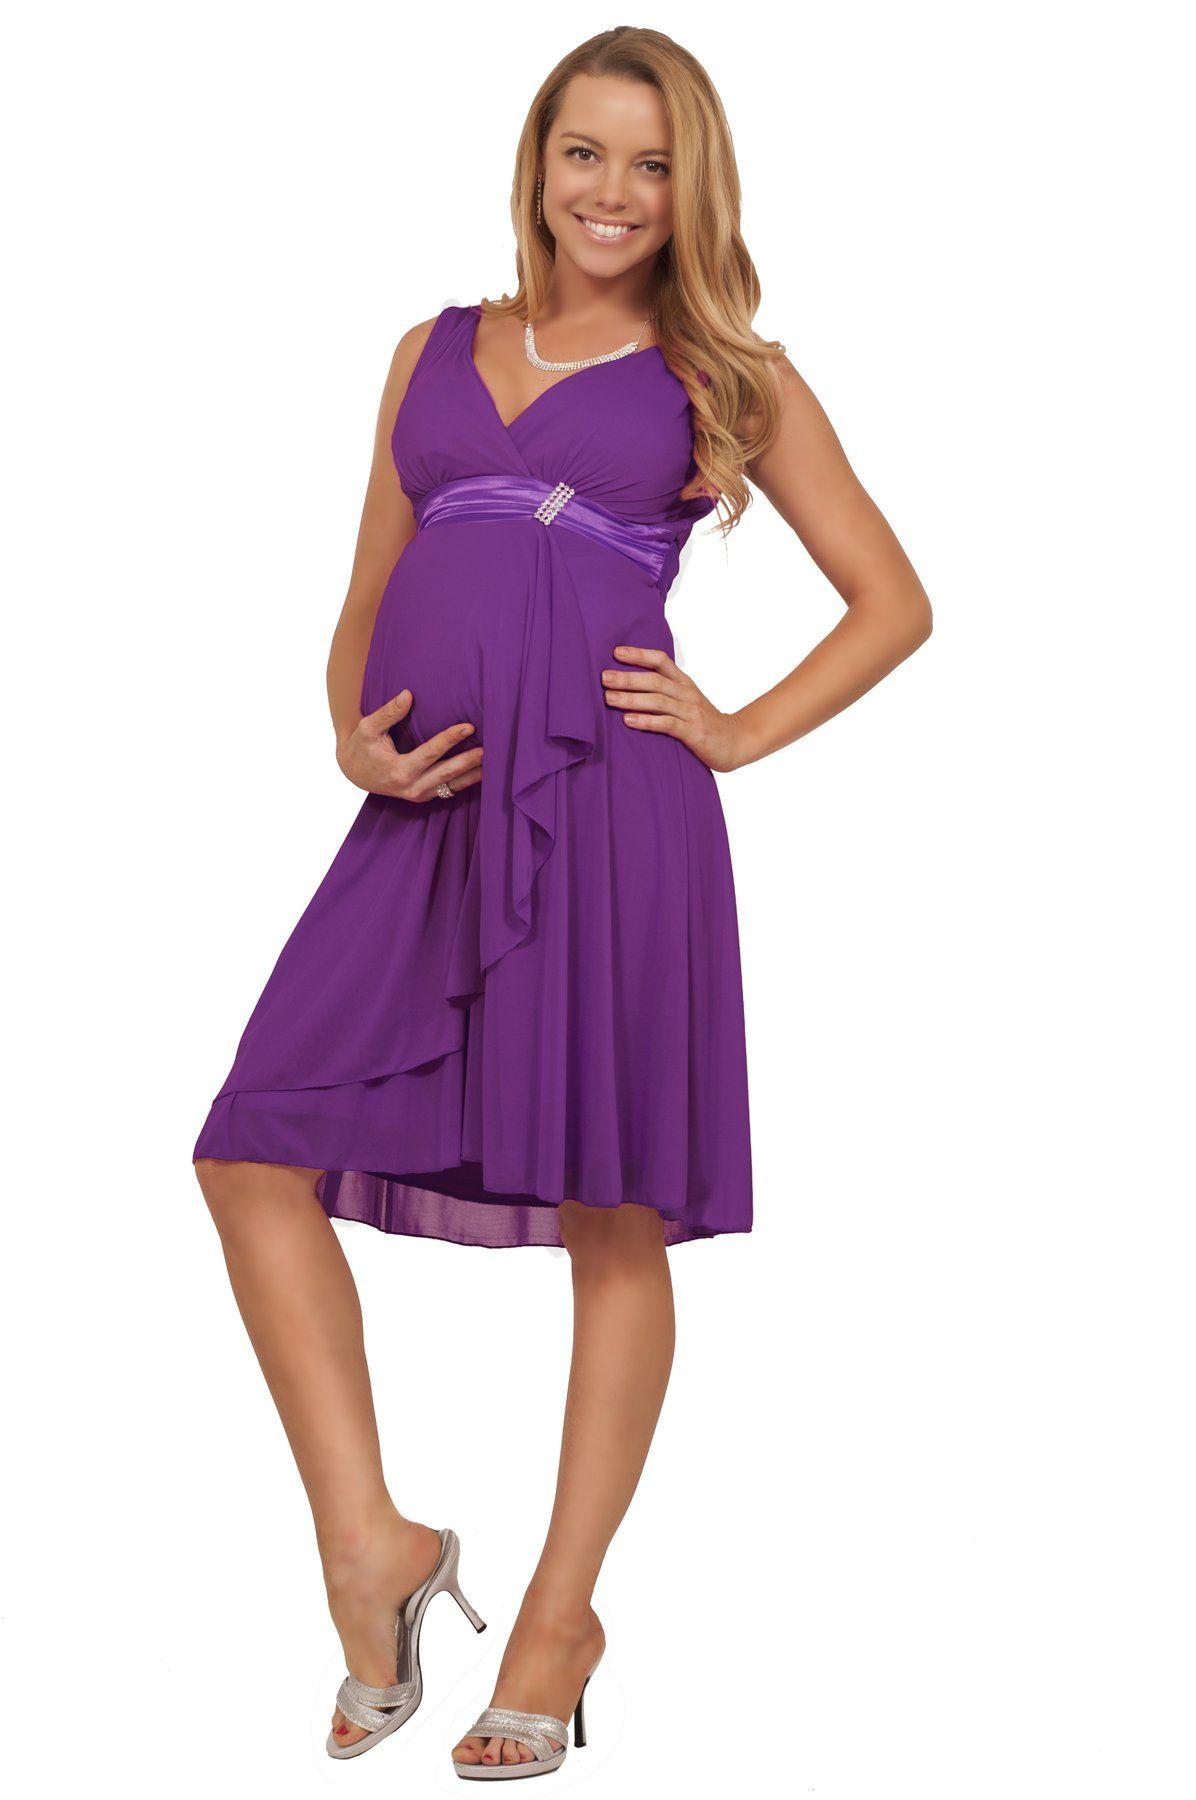 fb21512177f Maternity Bridesmaid Wedding Party Formal V-Neck Rhinestone Chiffon Dress  at Amazon Women s Clothing store